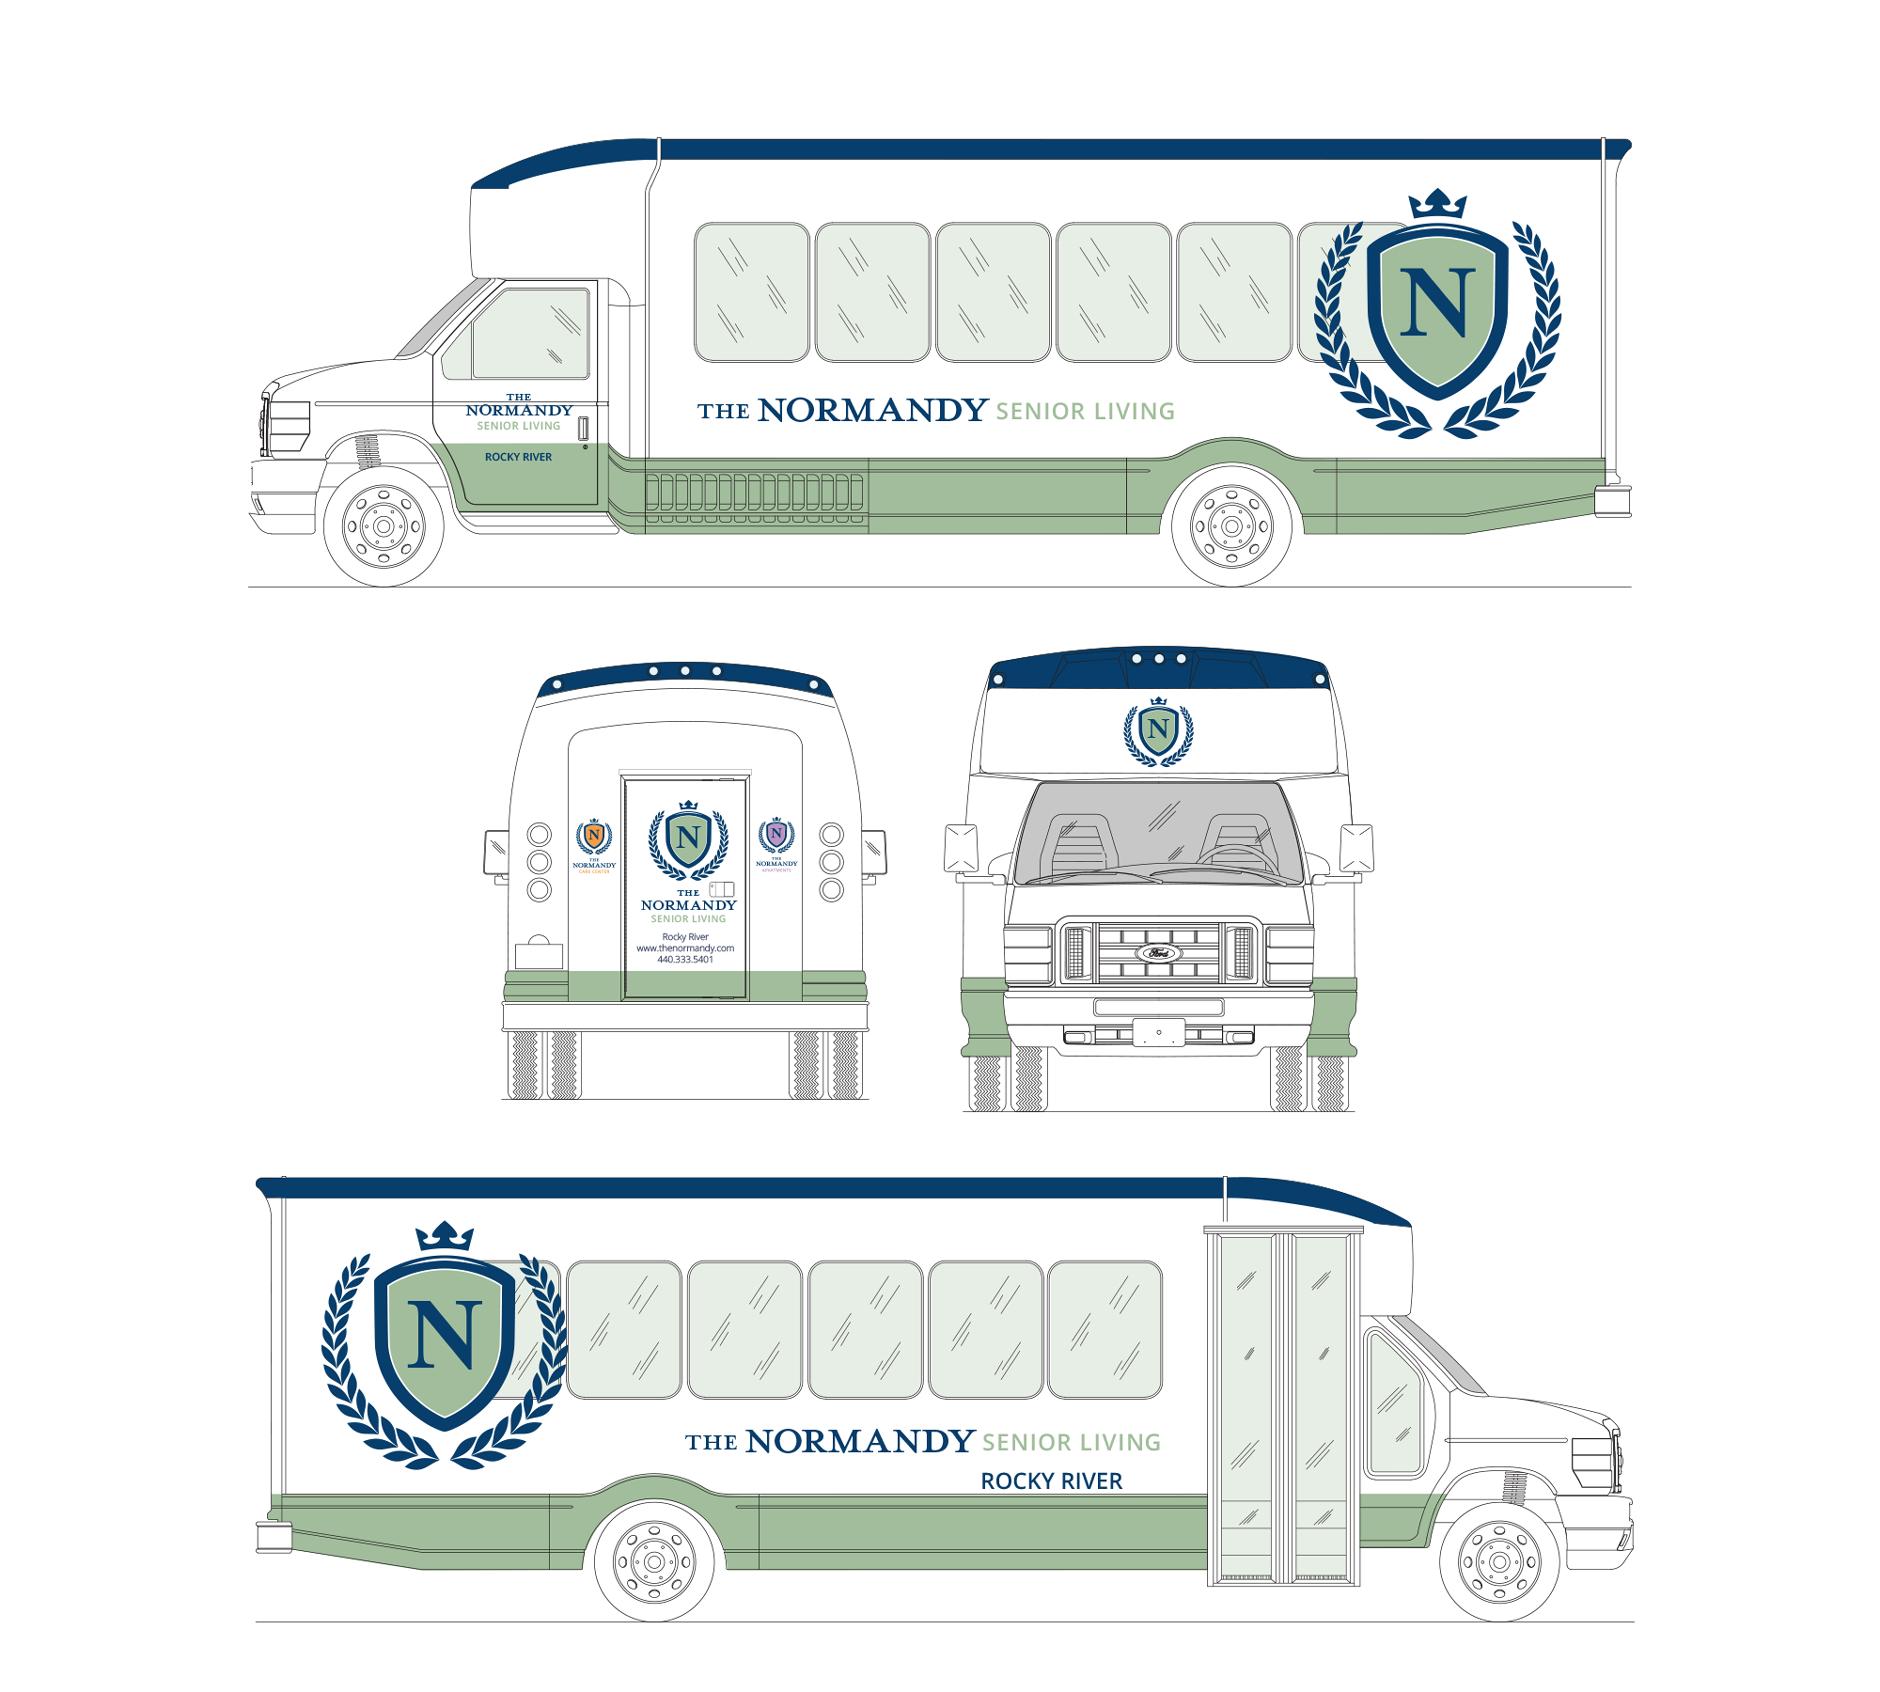 The Normandy Senior Living Fleet Bus Graphic   Rebranding Agency